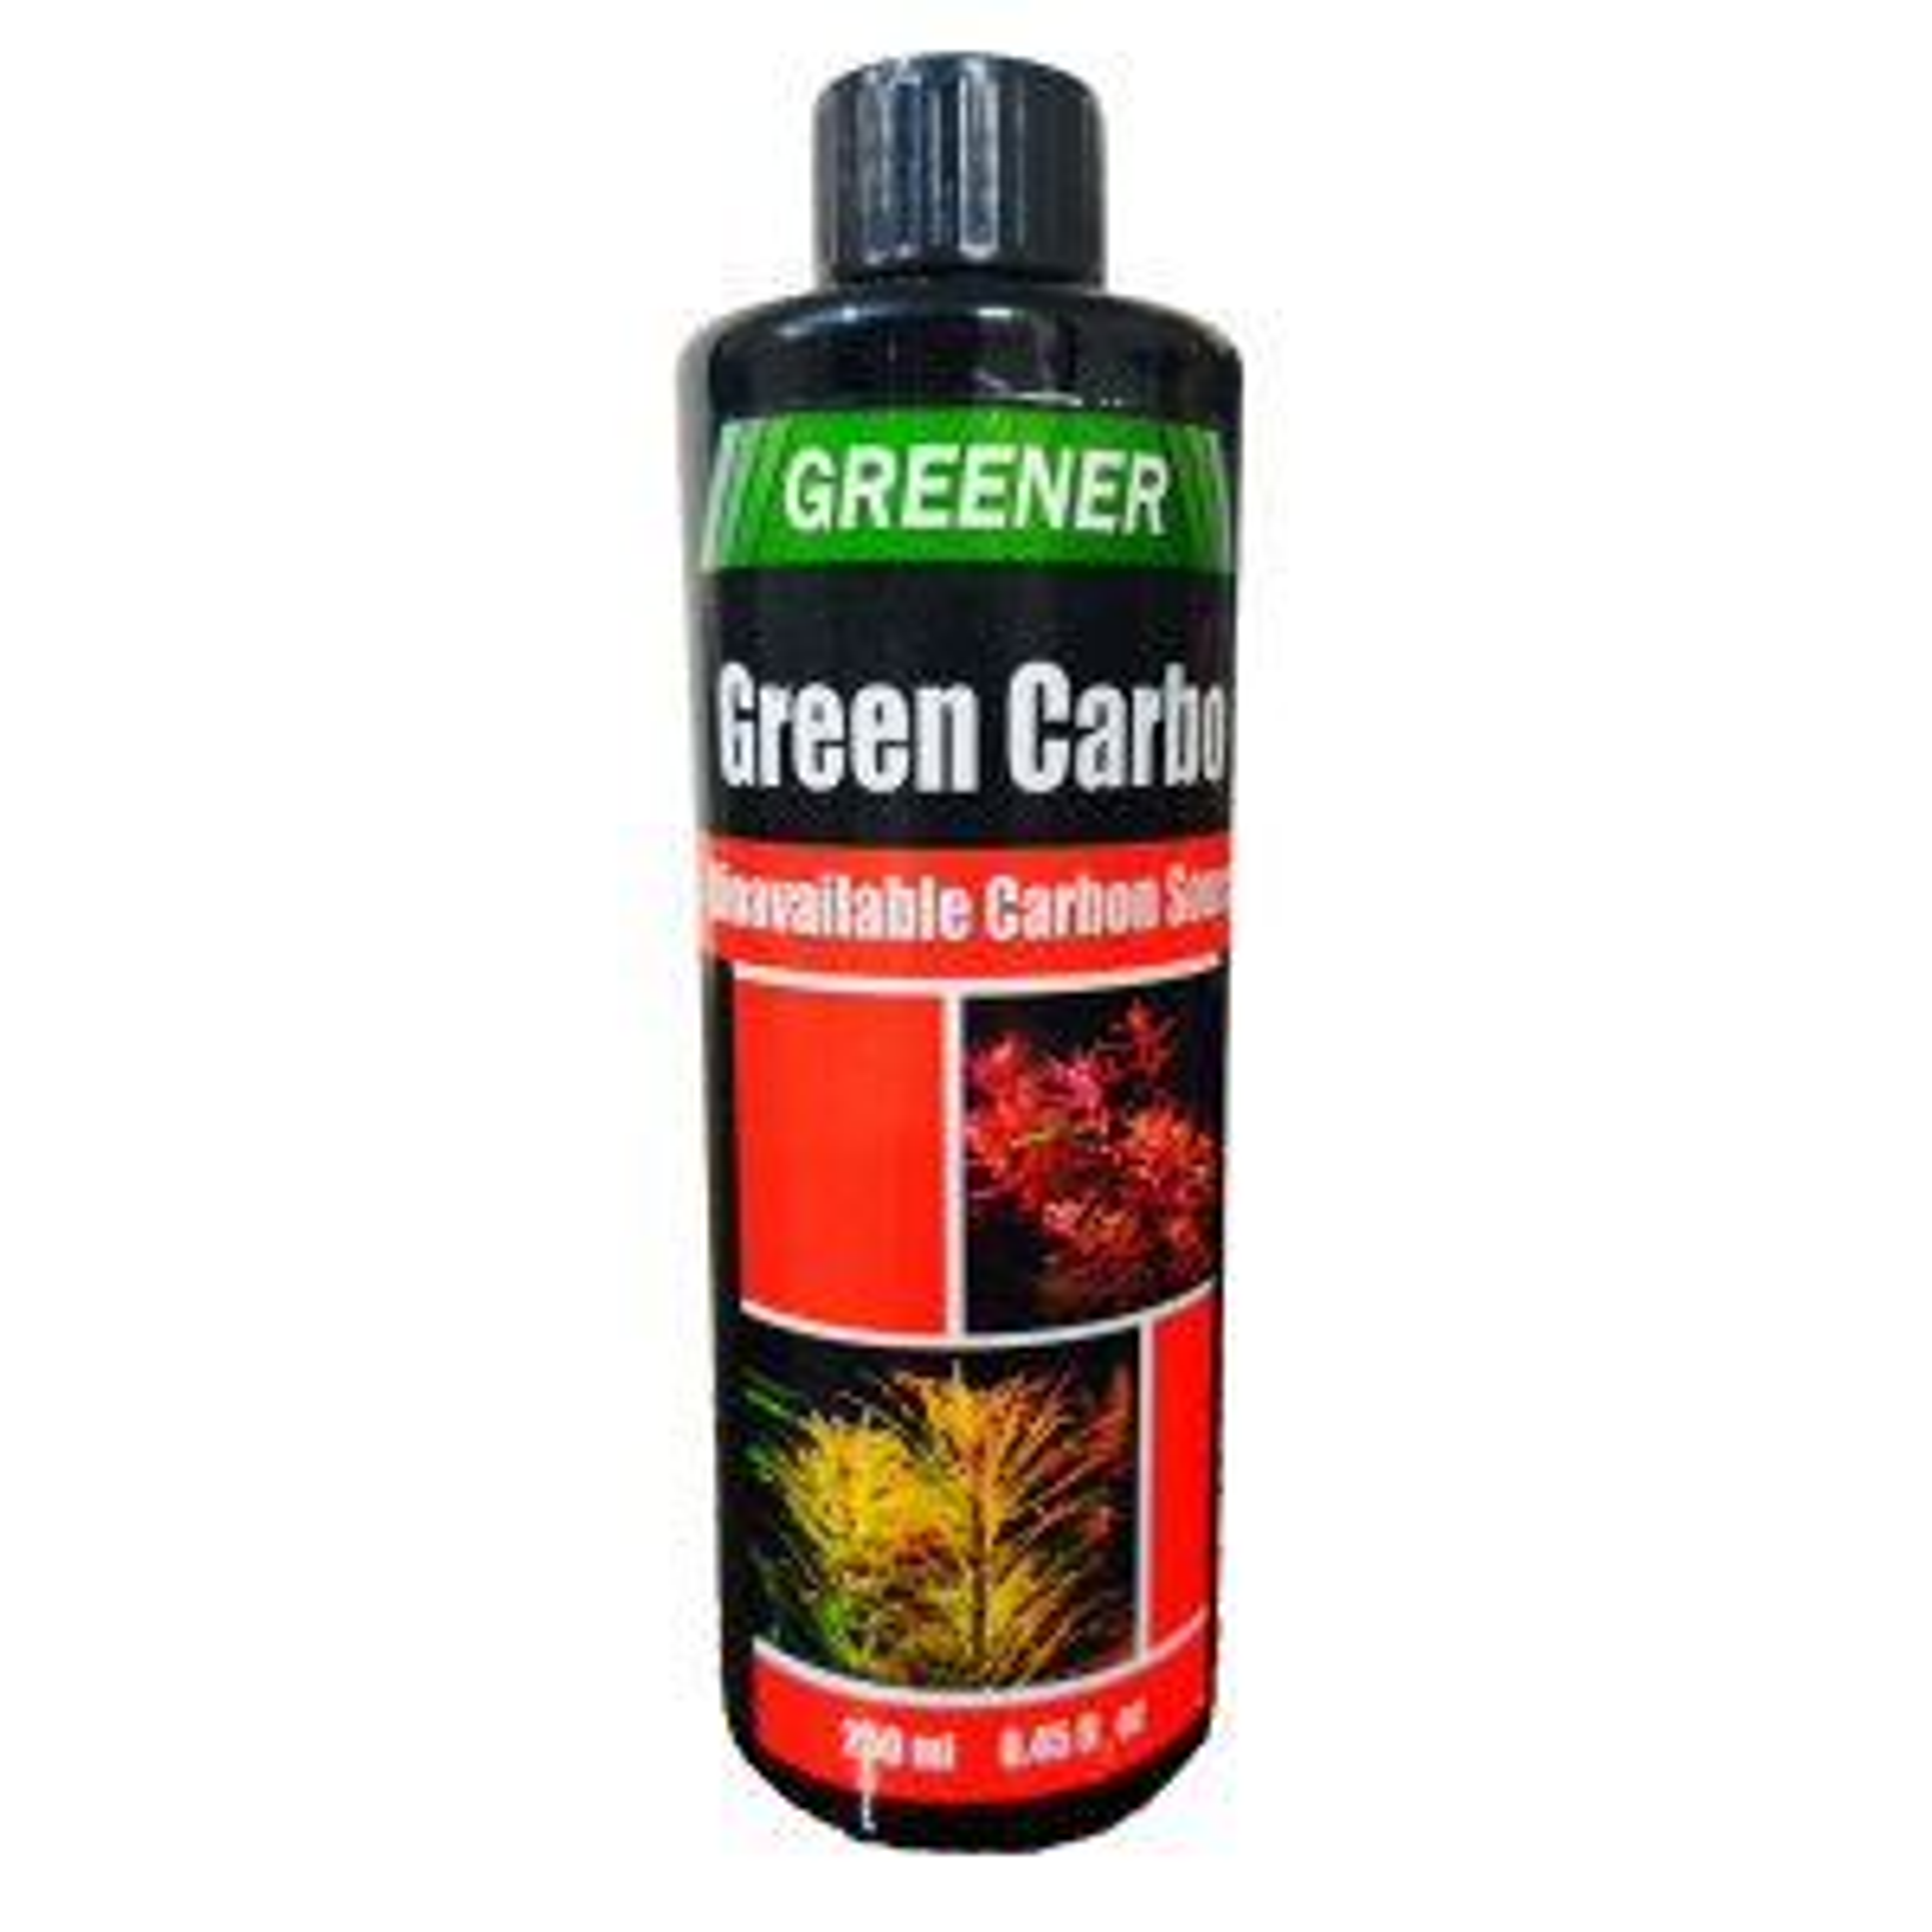 محلول کربن آکواریوم گرینر مدل Green carbo حجم 250 میلی لیتر